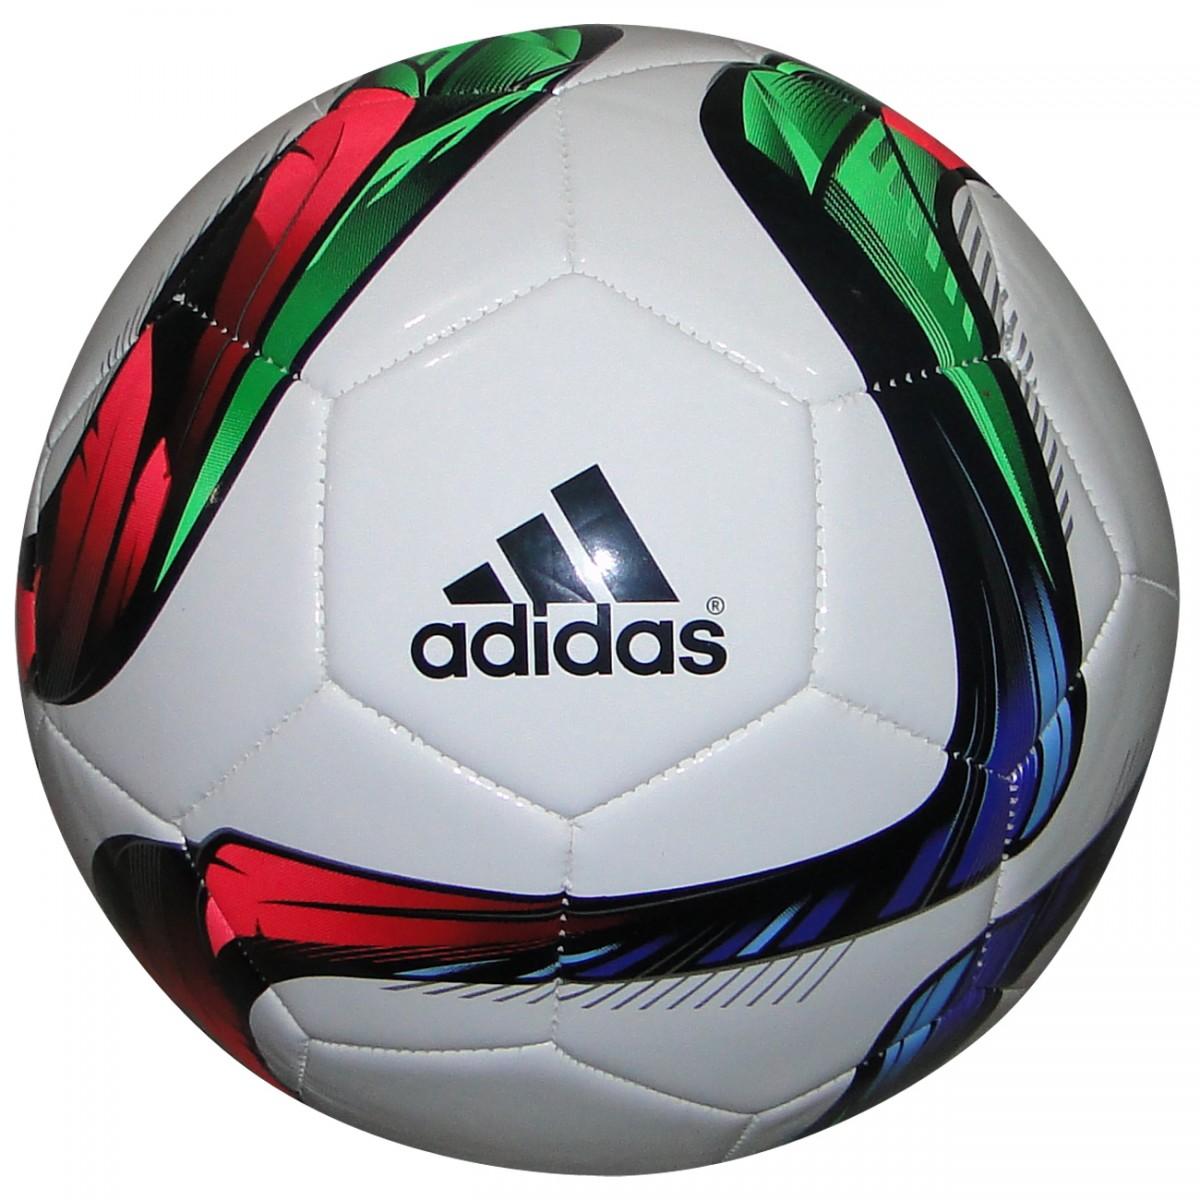 Bola Adidas Conext 15 M36887 - Branco Multicolor - Chuteira Nike ... 762aa740102a0